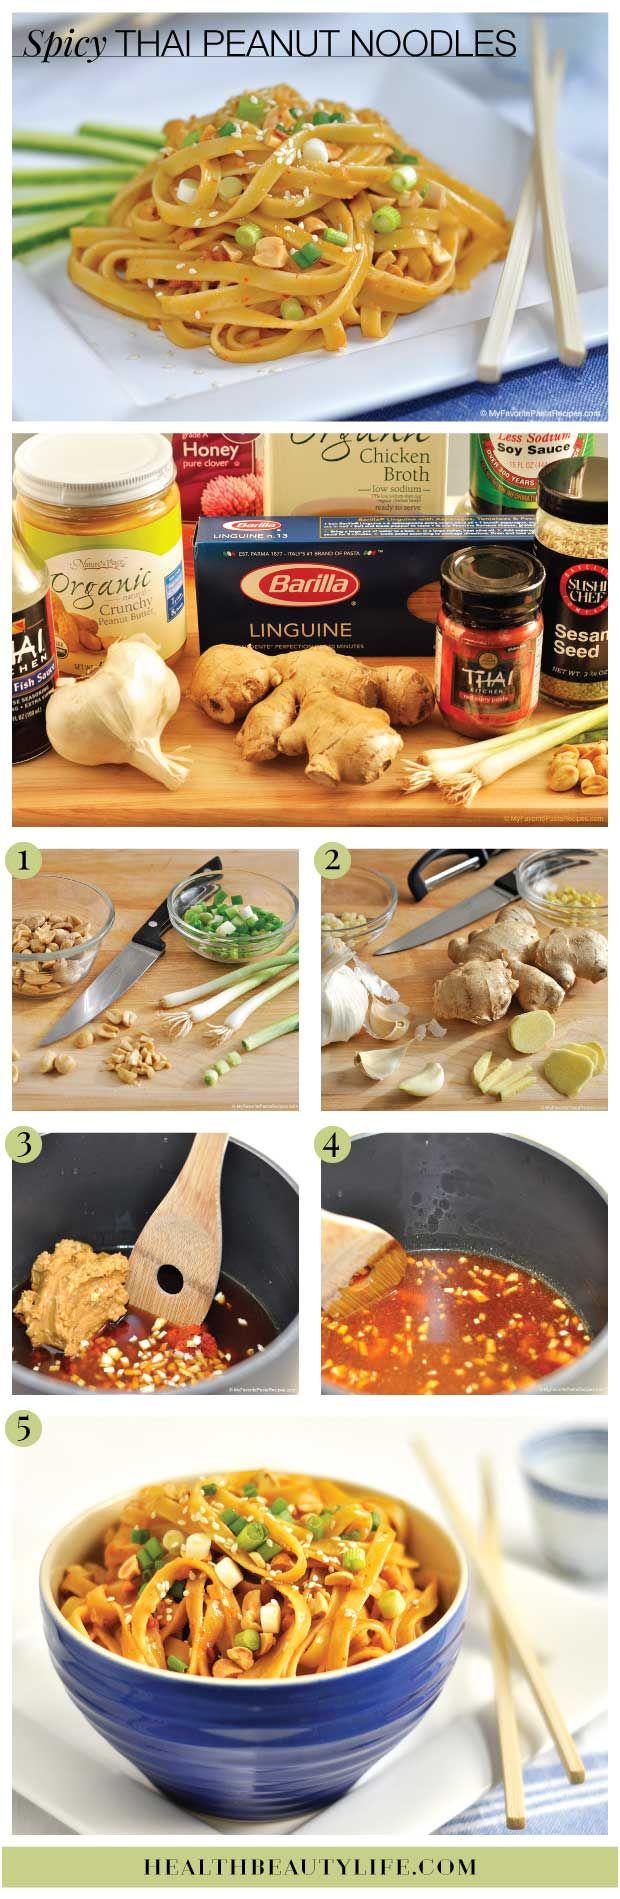 Oh yes: Spicy Thai Peanut Noodles #Recipe // Via Health Beauty Life